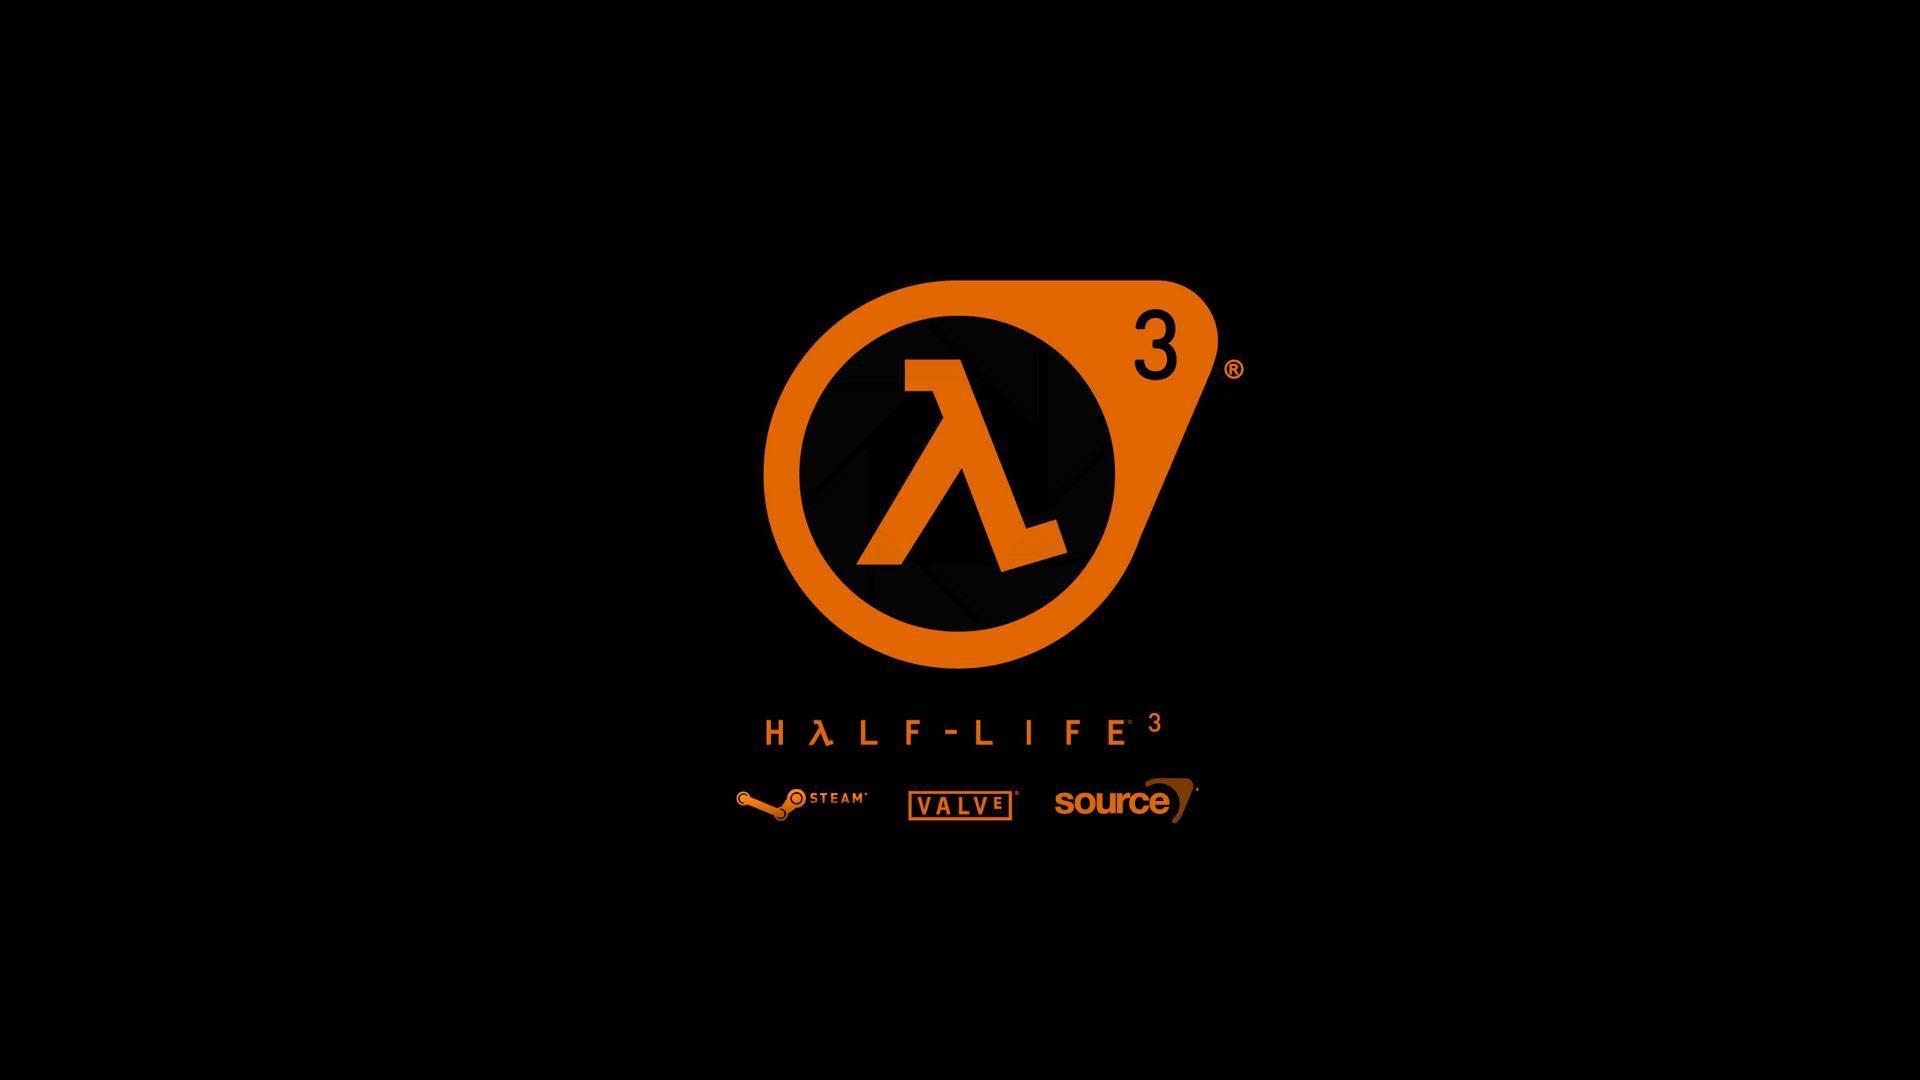 Half-Life 3 VR